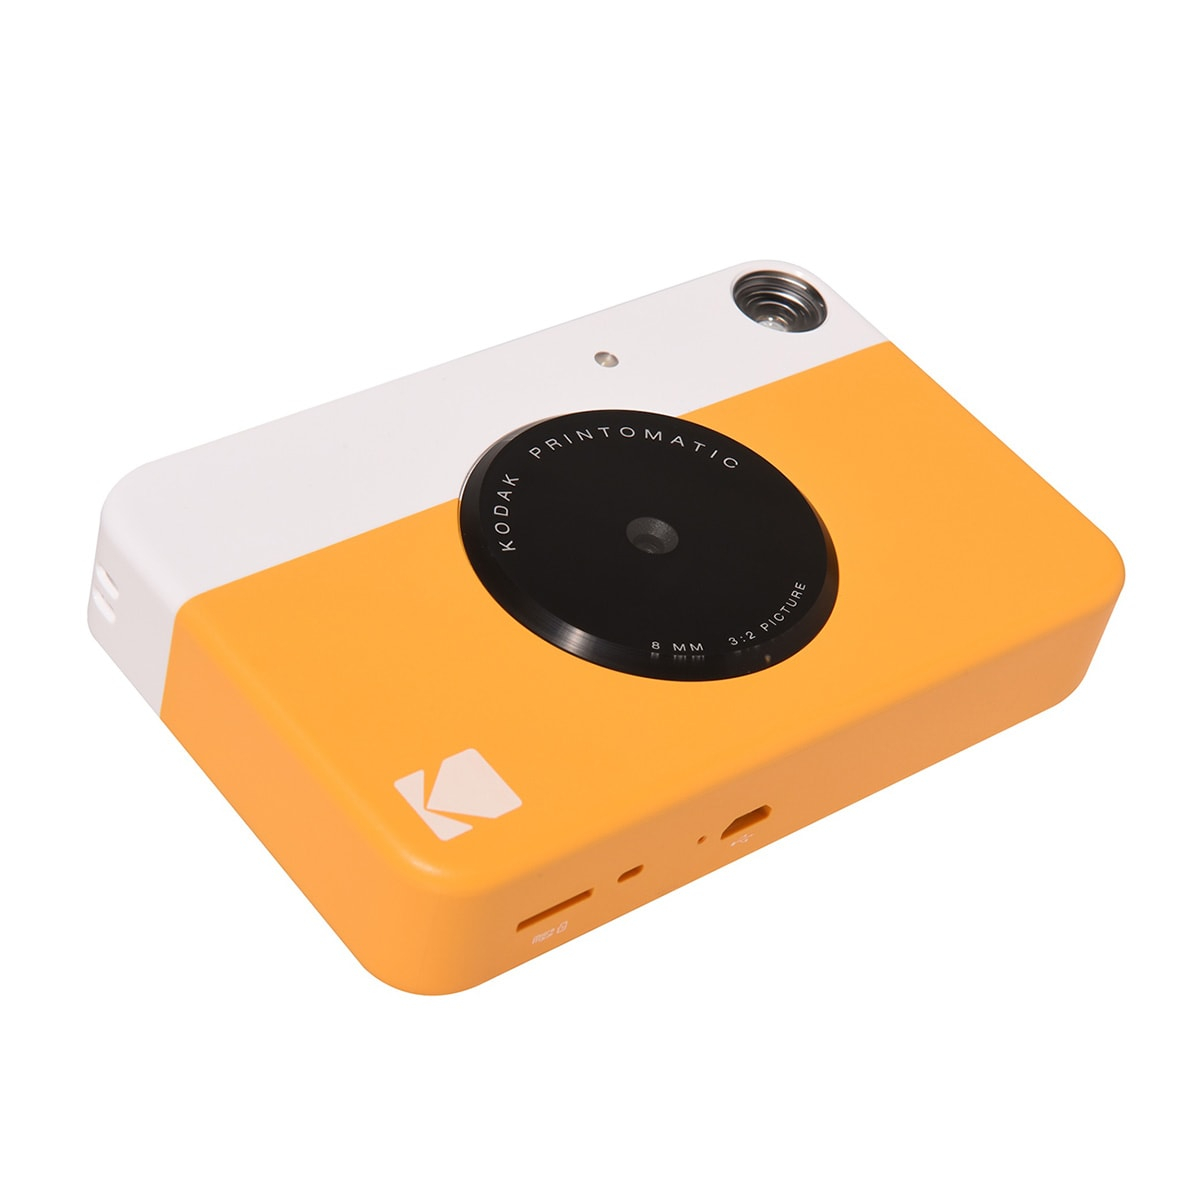 Fotocamera digitale istantanea 10 MP con carta fotografica adesiva Zink